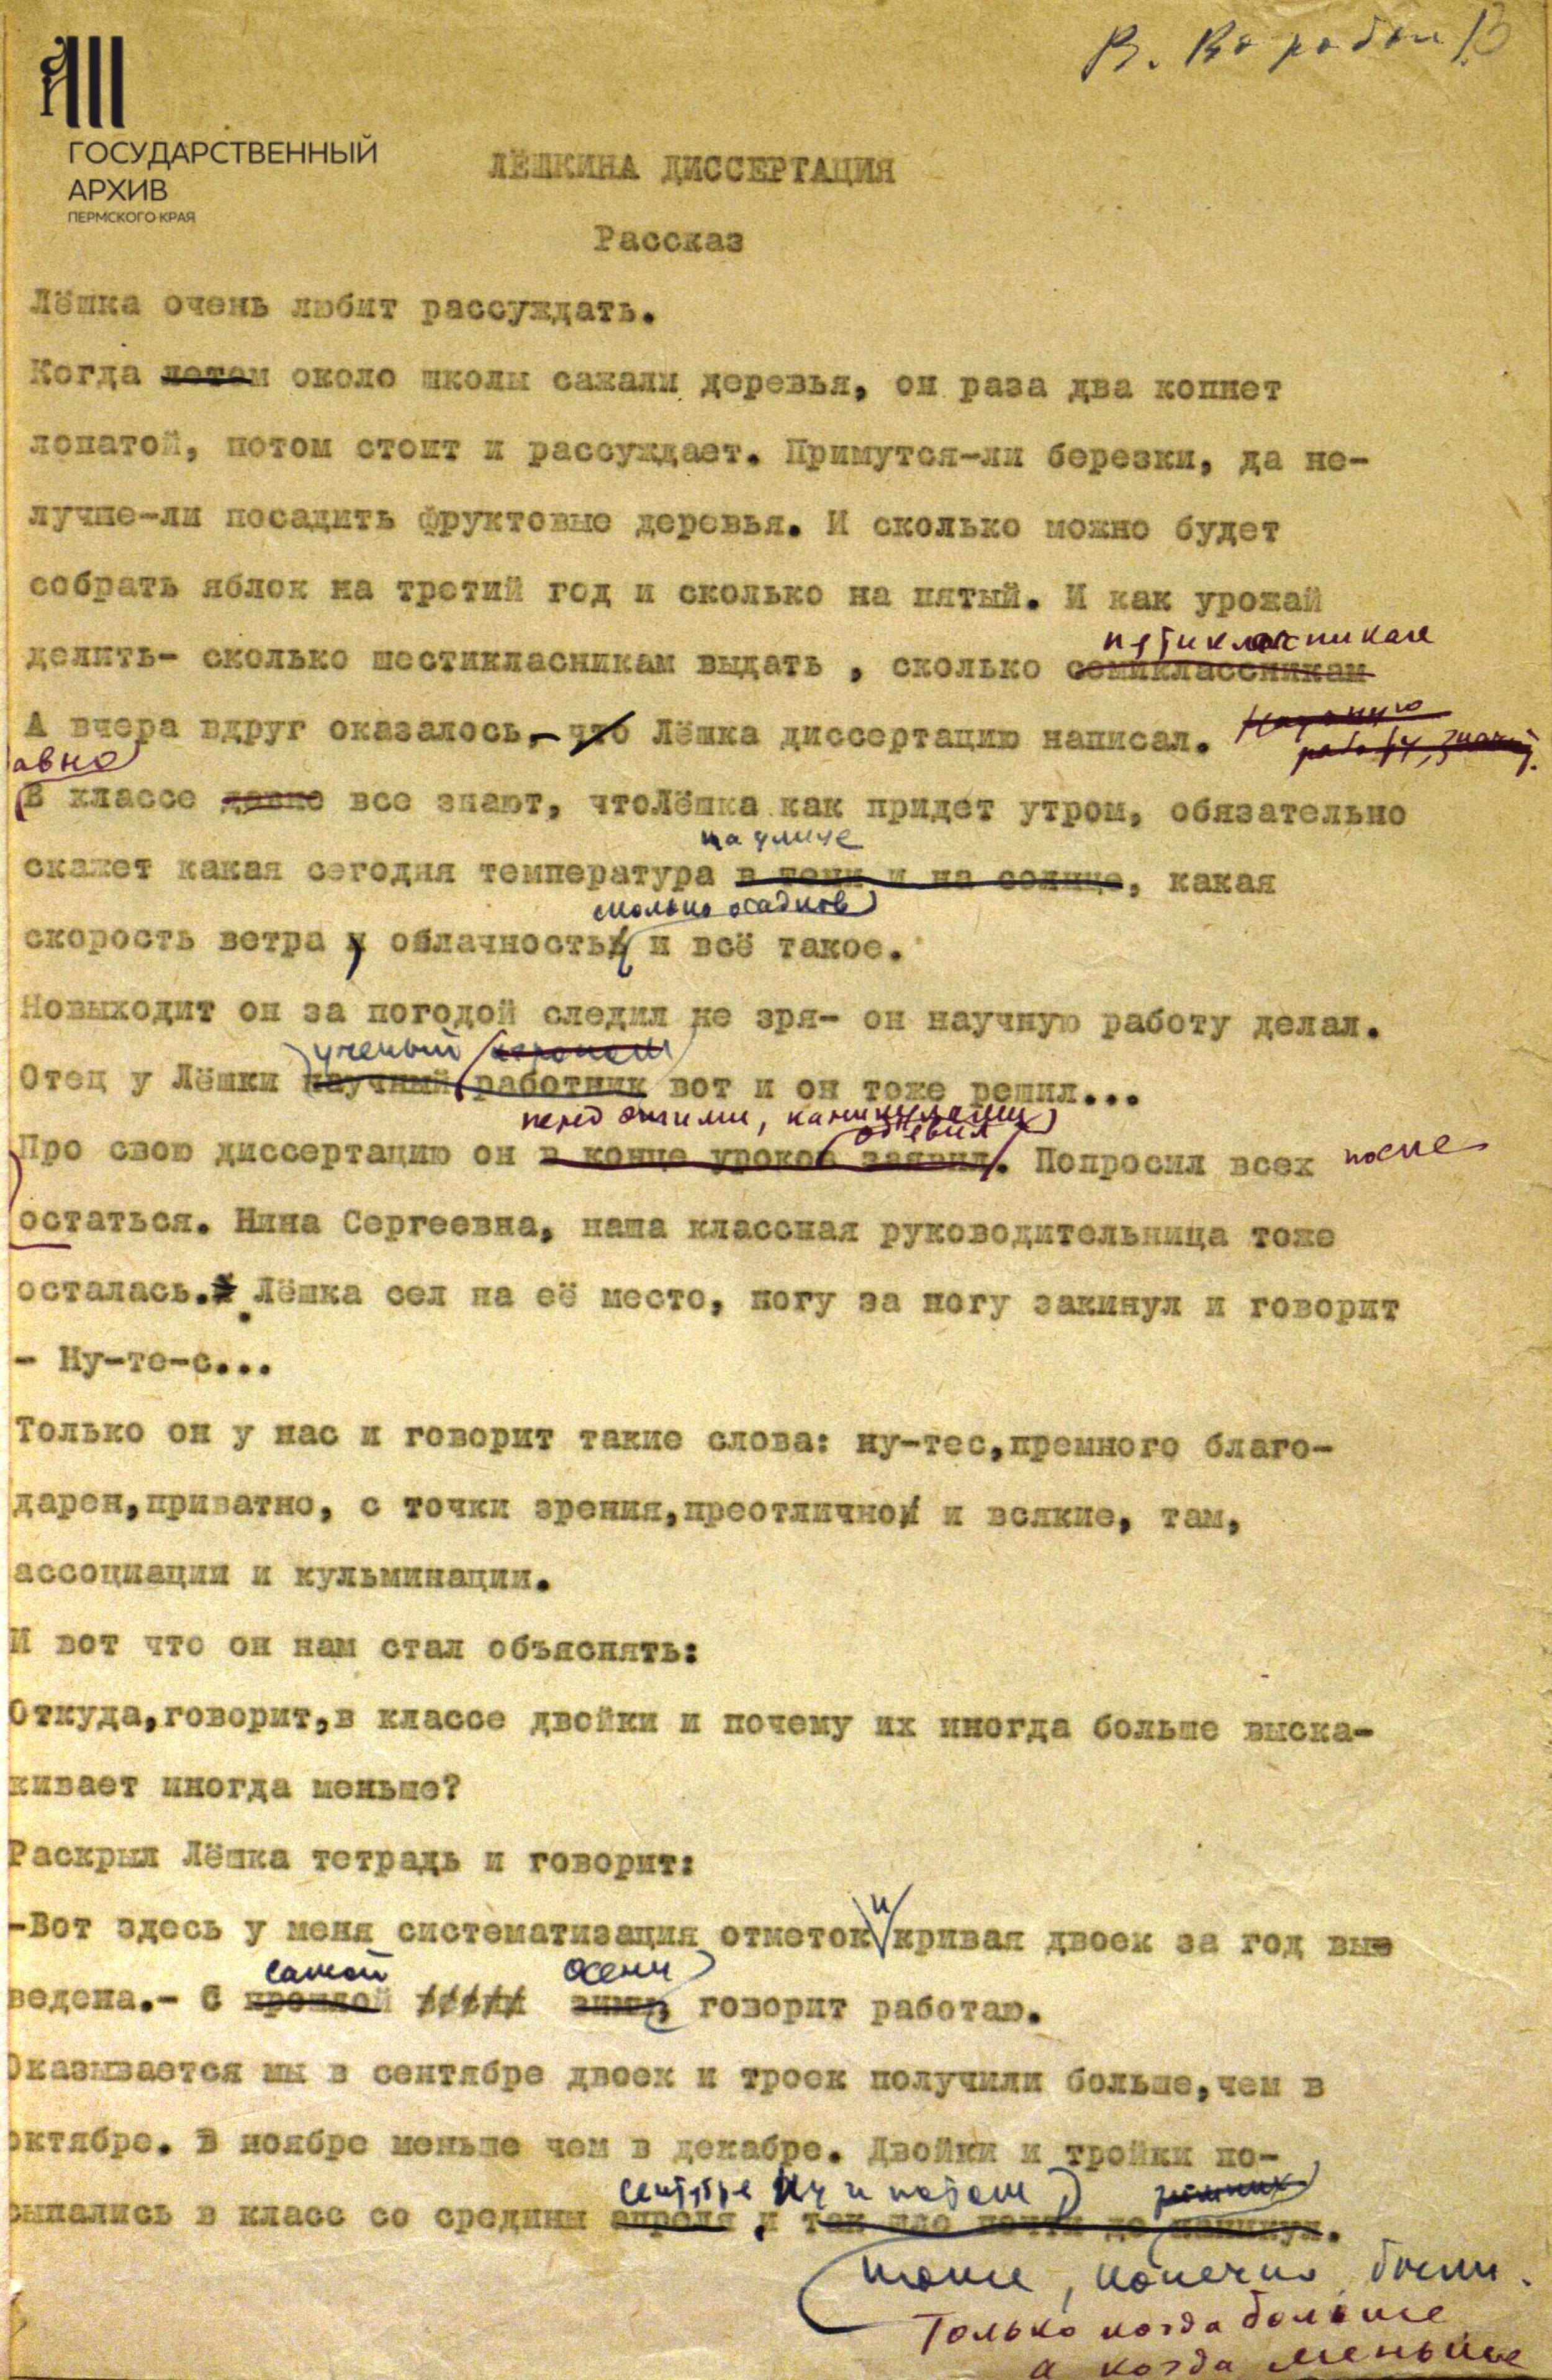 Пермский Пантеон Владимир Воробьёв  Пермский Пантеон Владимир Воробьёв